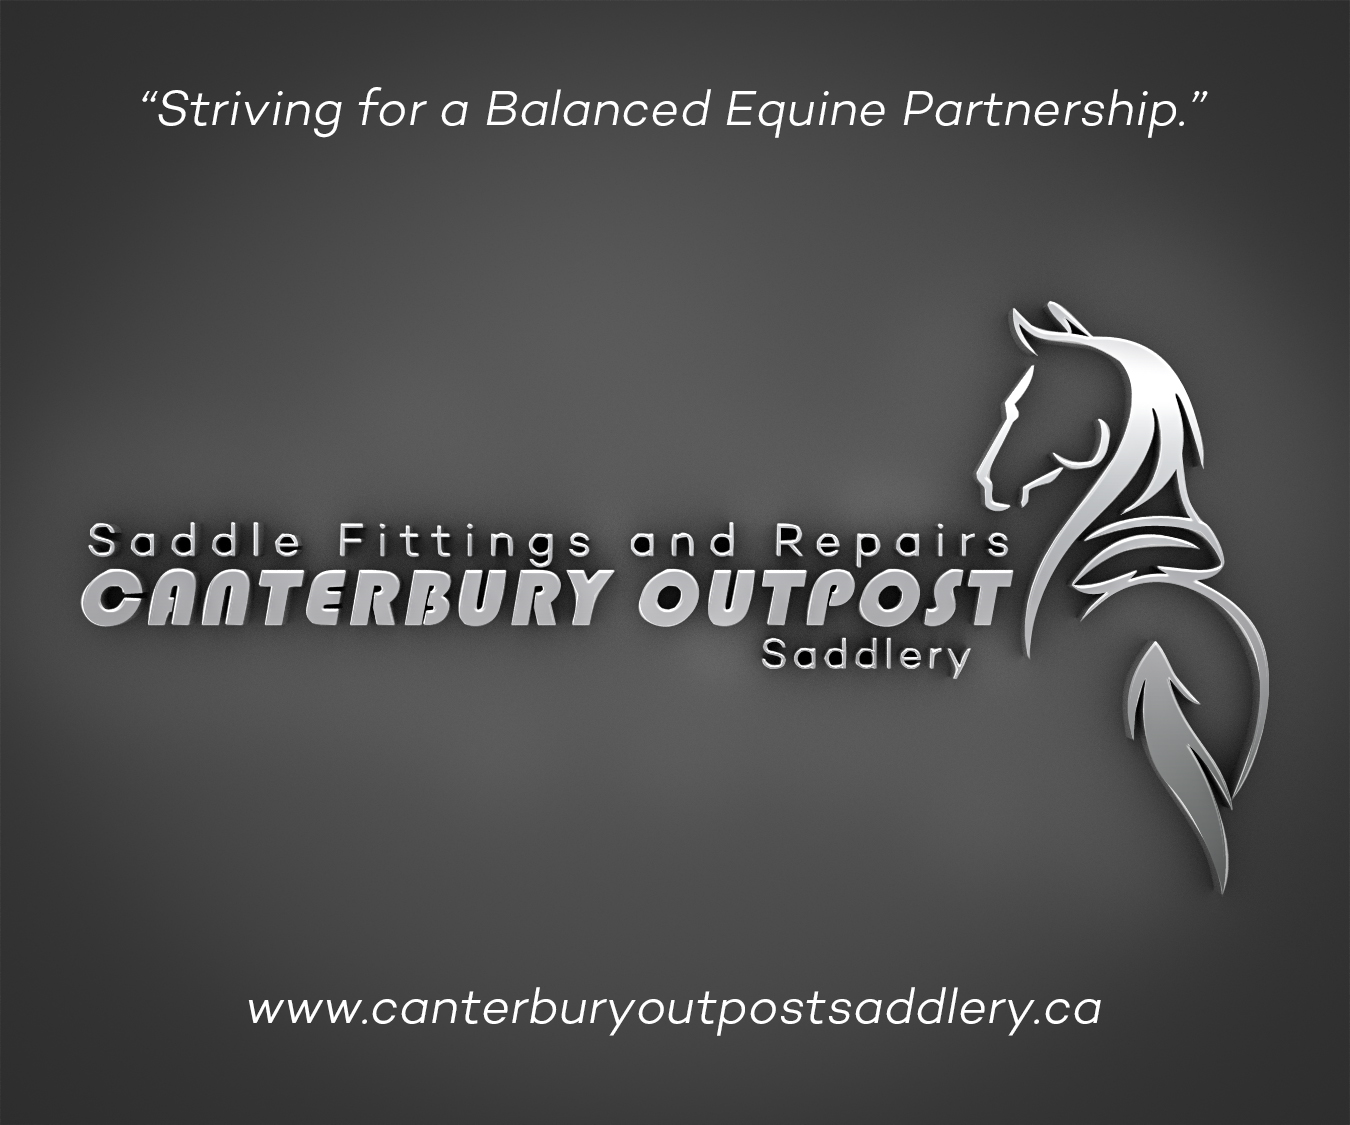 Canterbury Outpost Saddlery